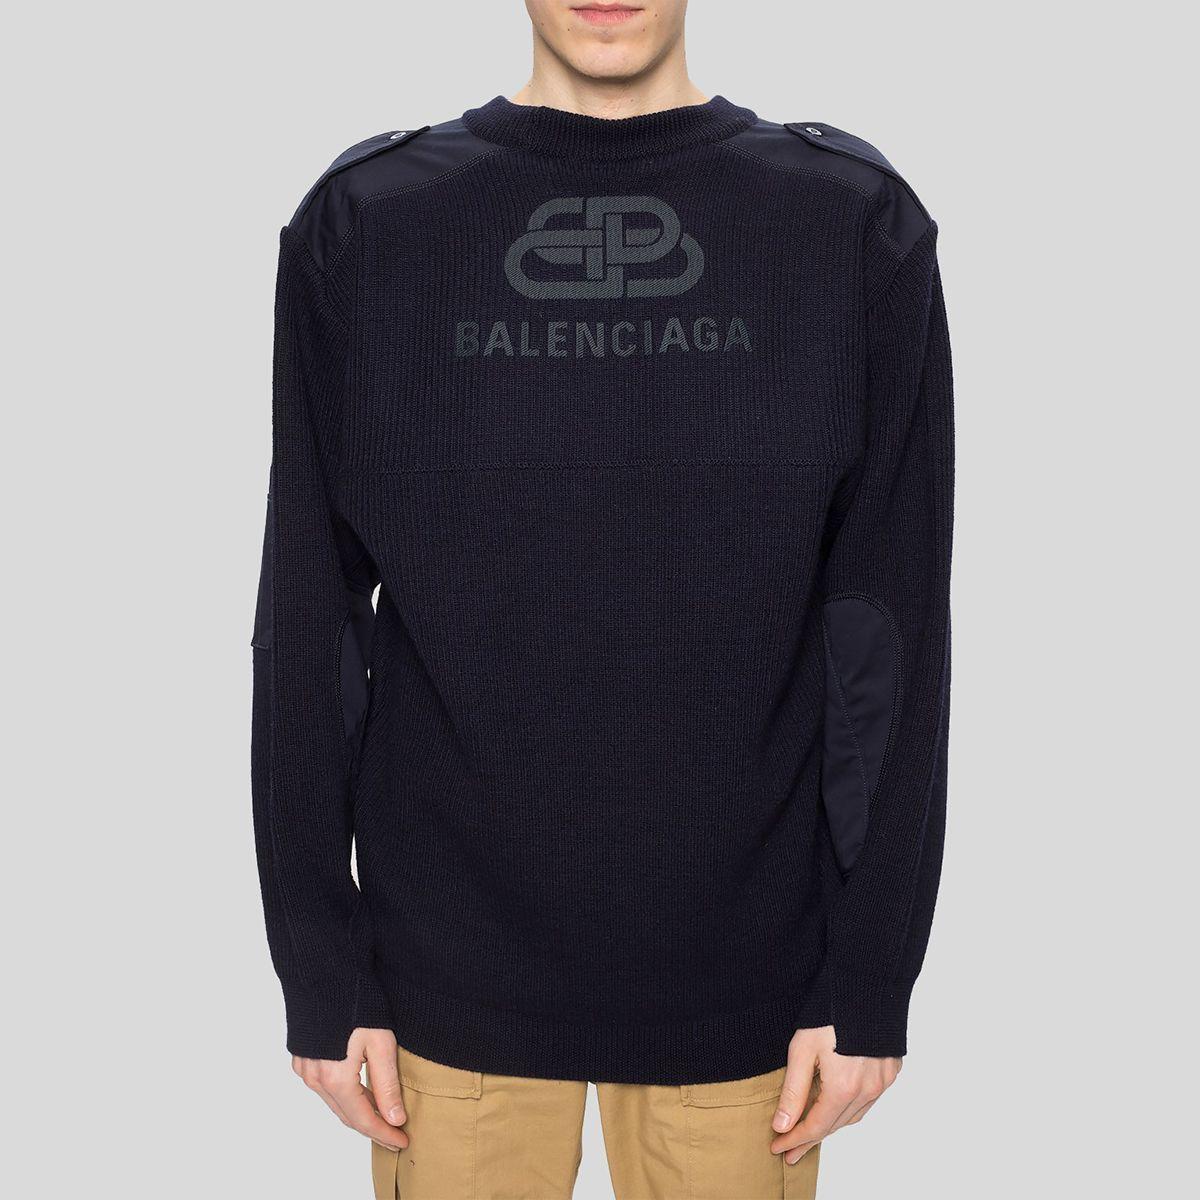 BALENCIAGA バレンシアガ ニット スウェーター ウィズ ロゴ ネイビーブルー  Knitted Sweater With Logo Navy Blue